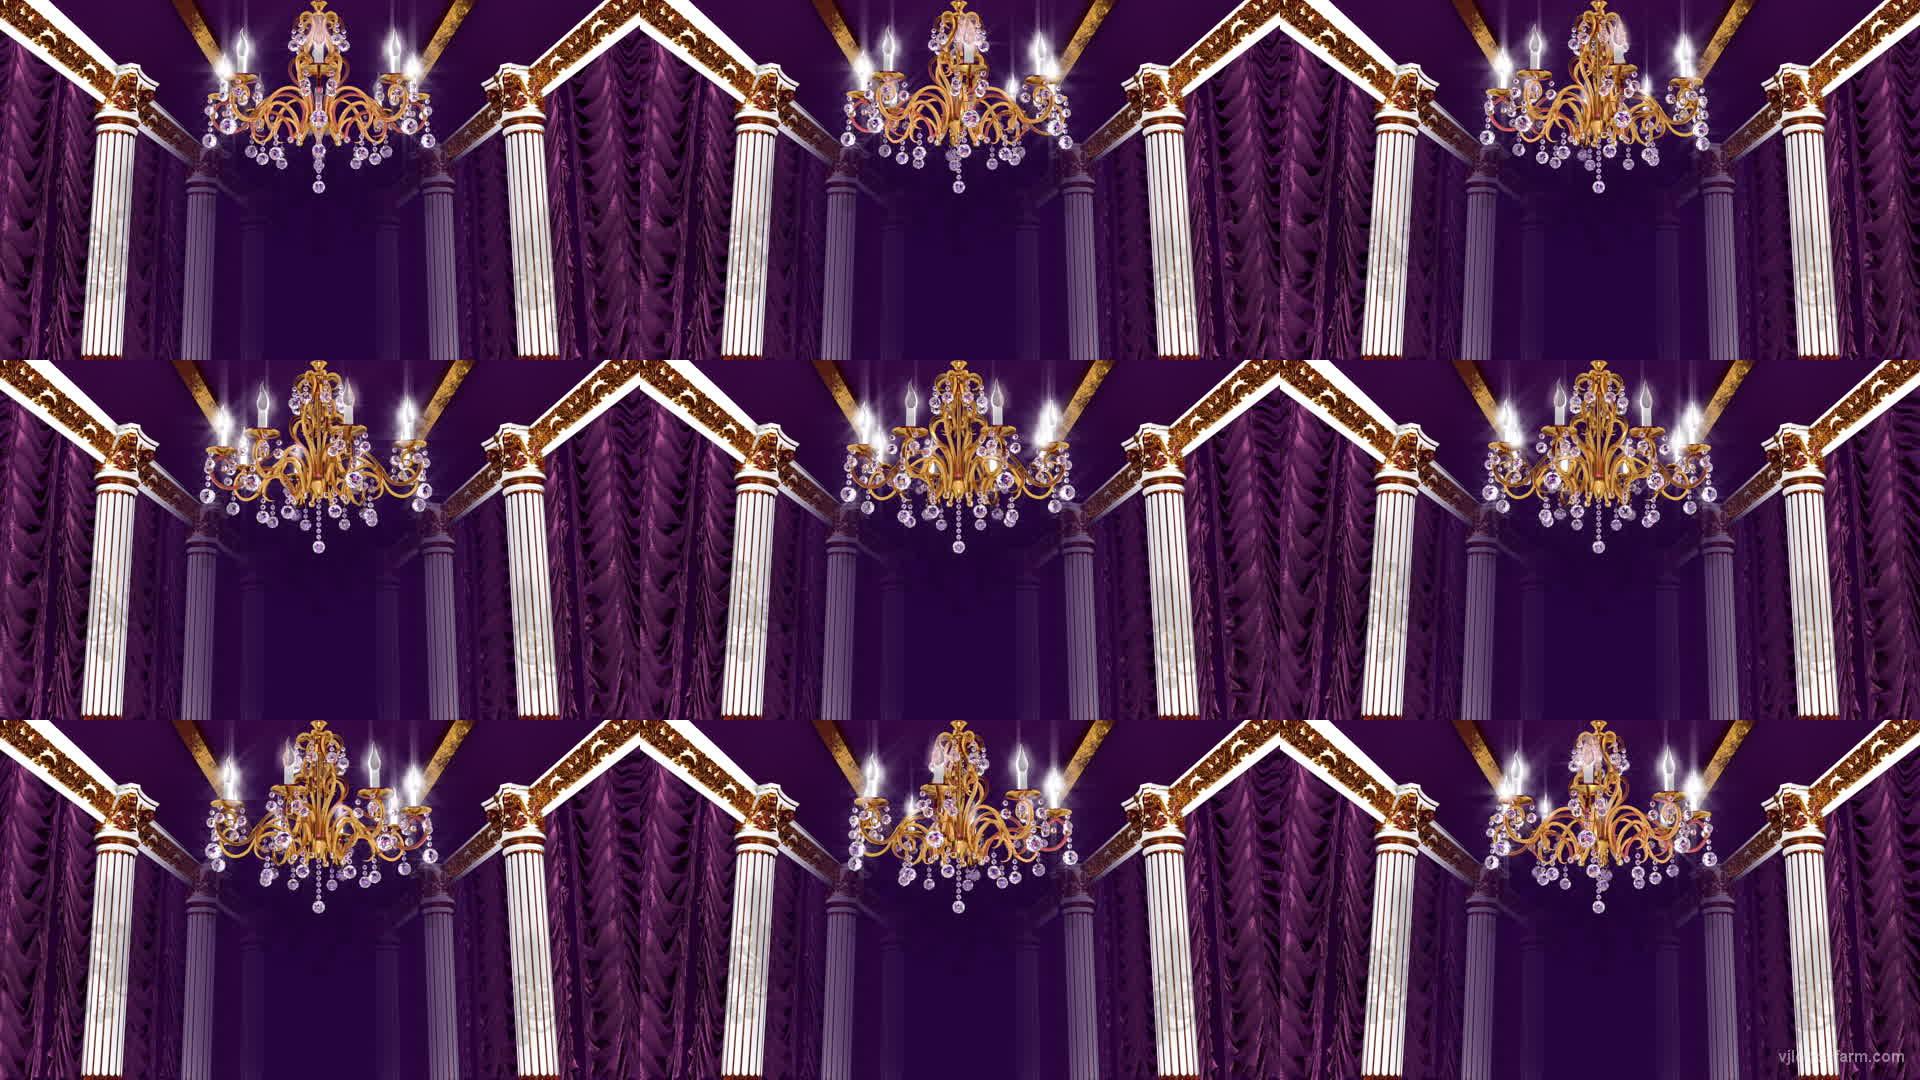 lustre de cristal asfour mais vj loop download full hd vj loop. Black Bedroom Furniture Sets. Home Design Ideas